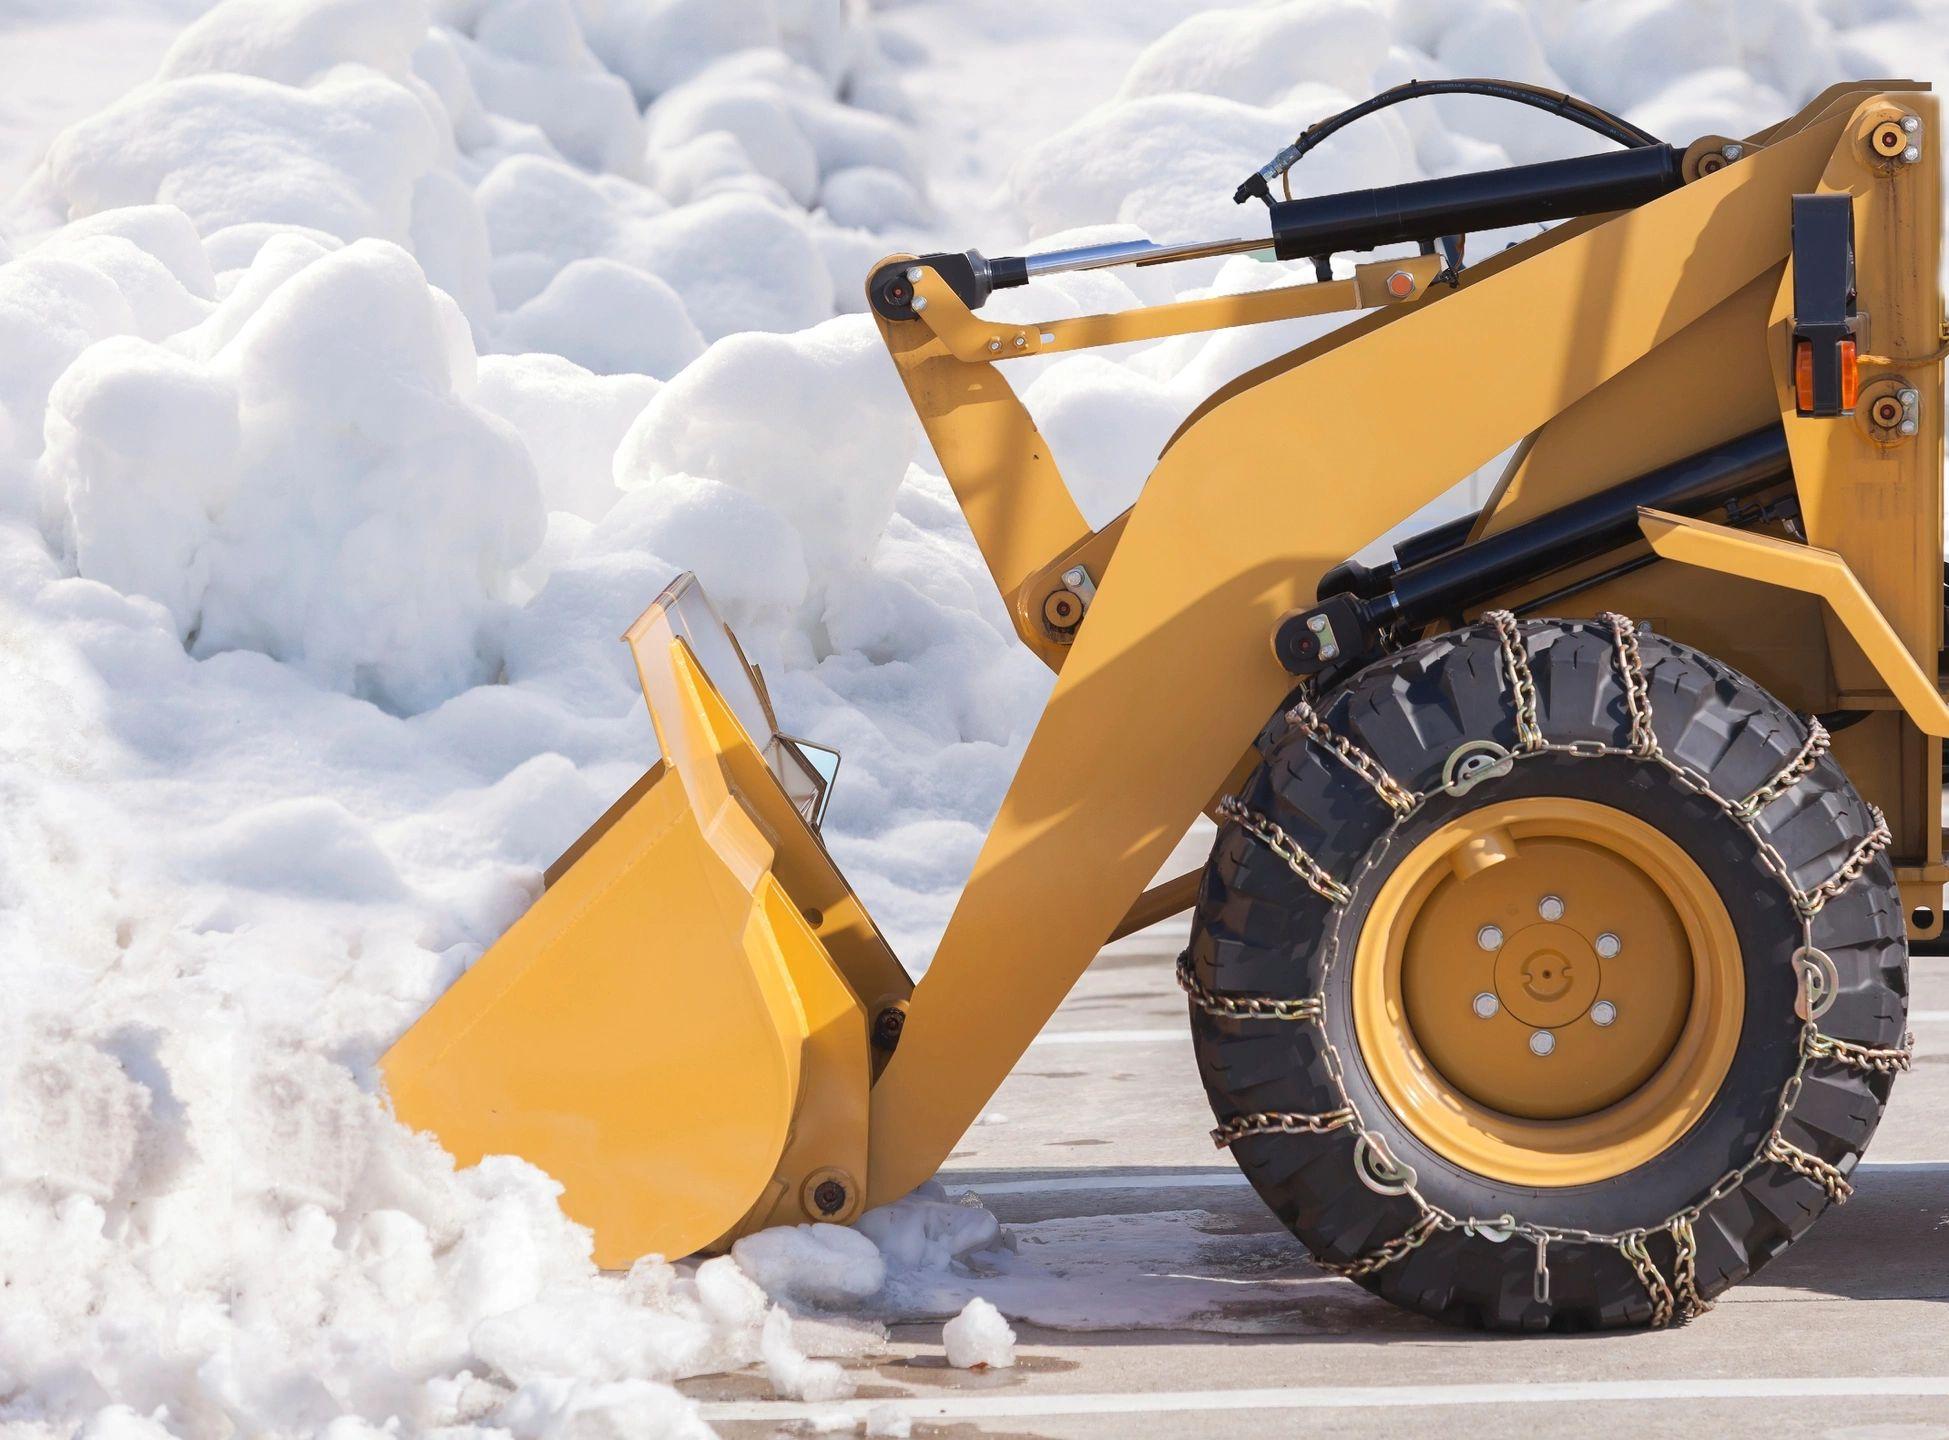 A machine removing snow.